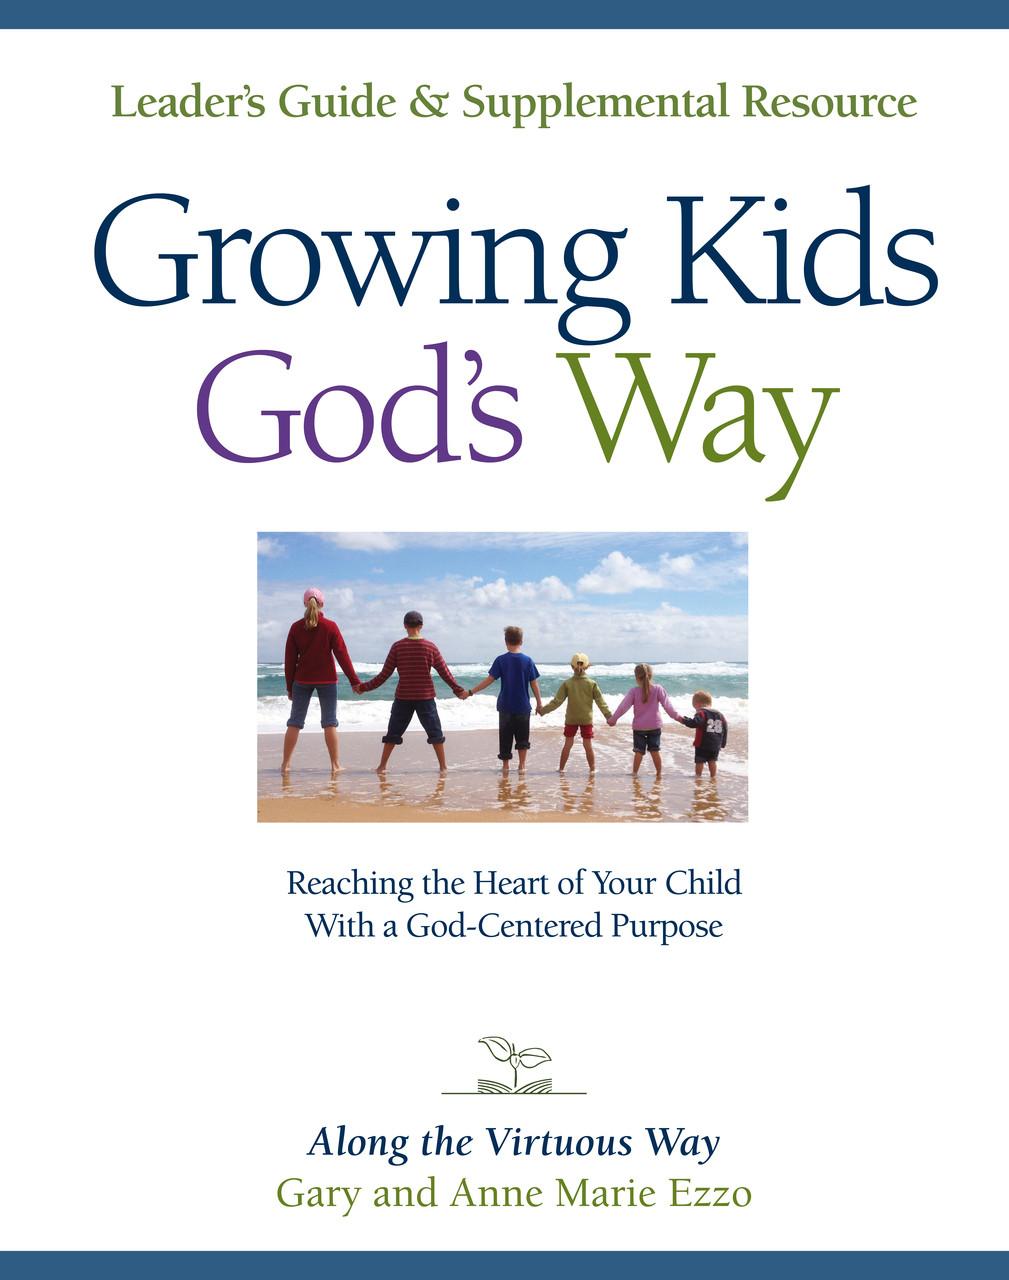 Growing Kids God's Way Leader's Guide